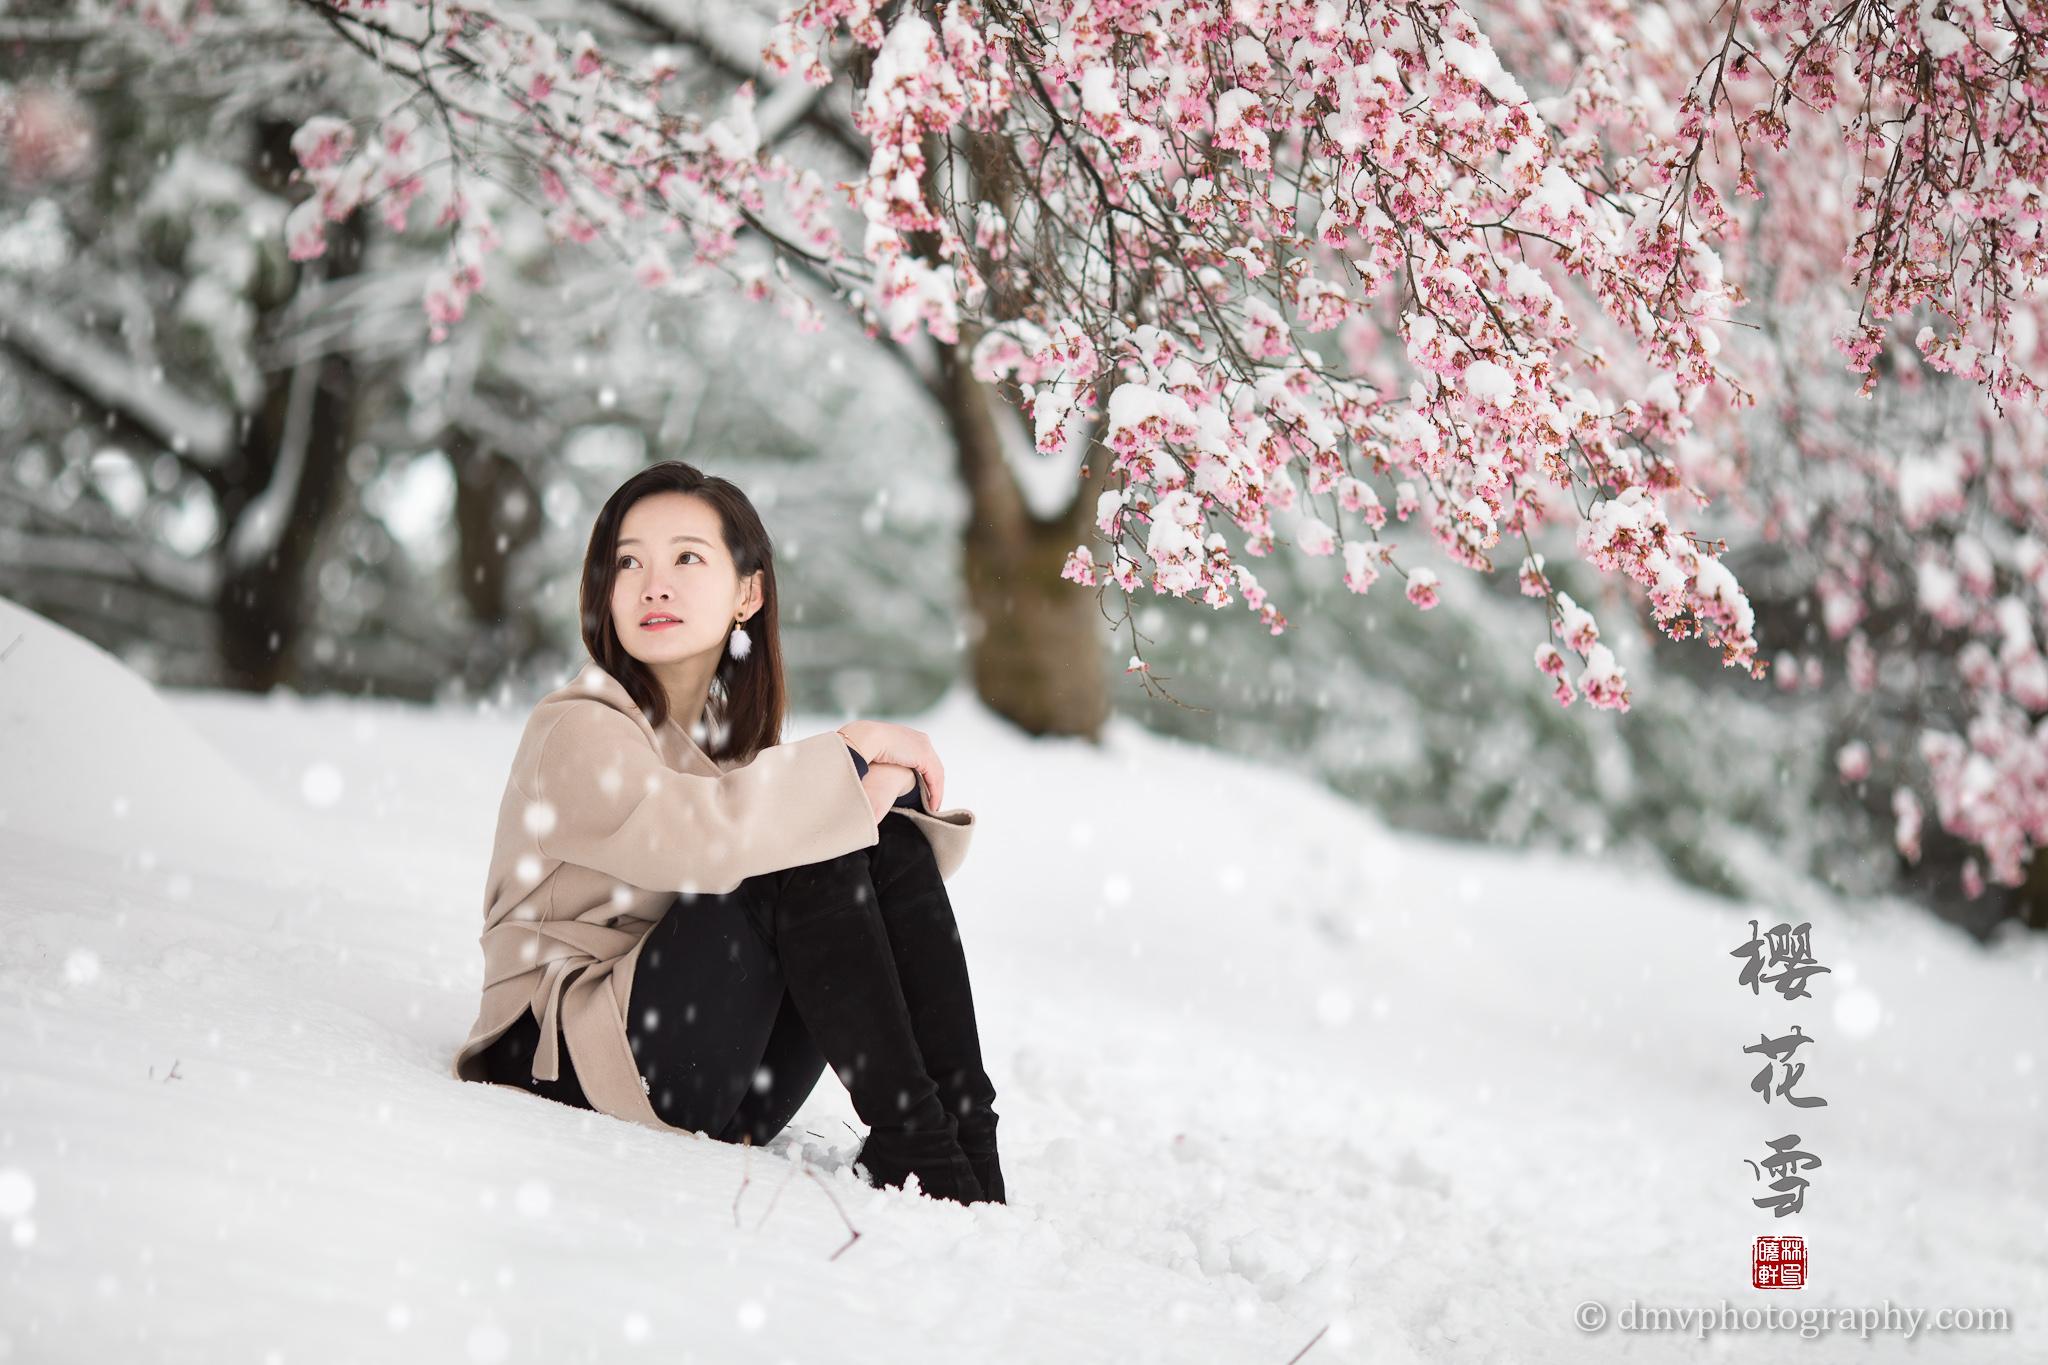 _D4_8457-snow